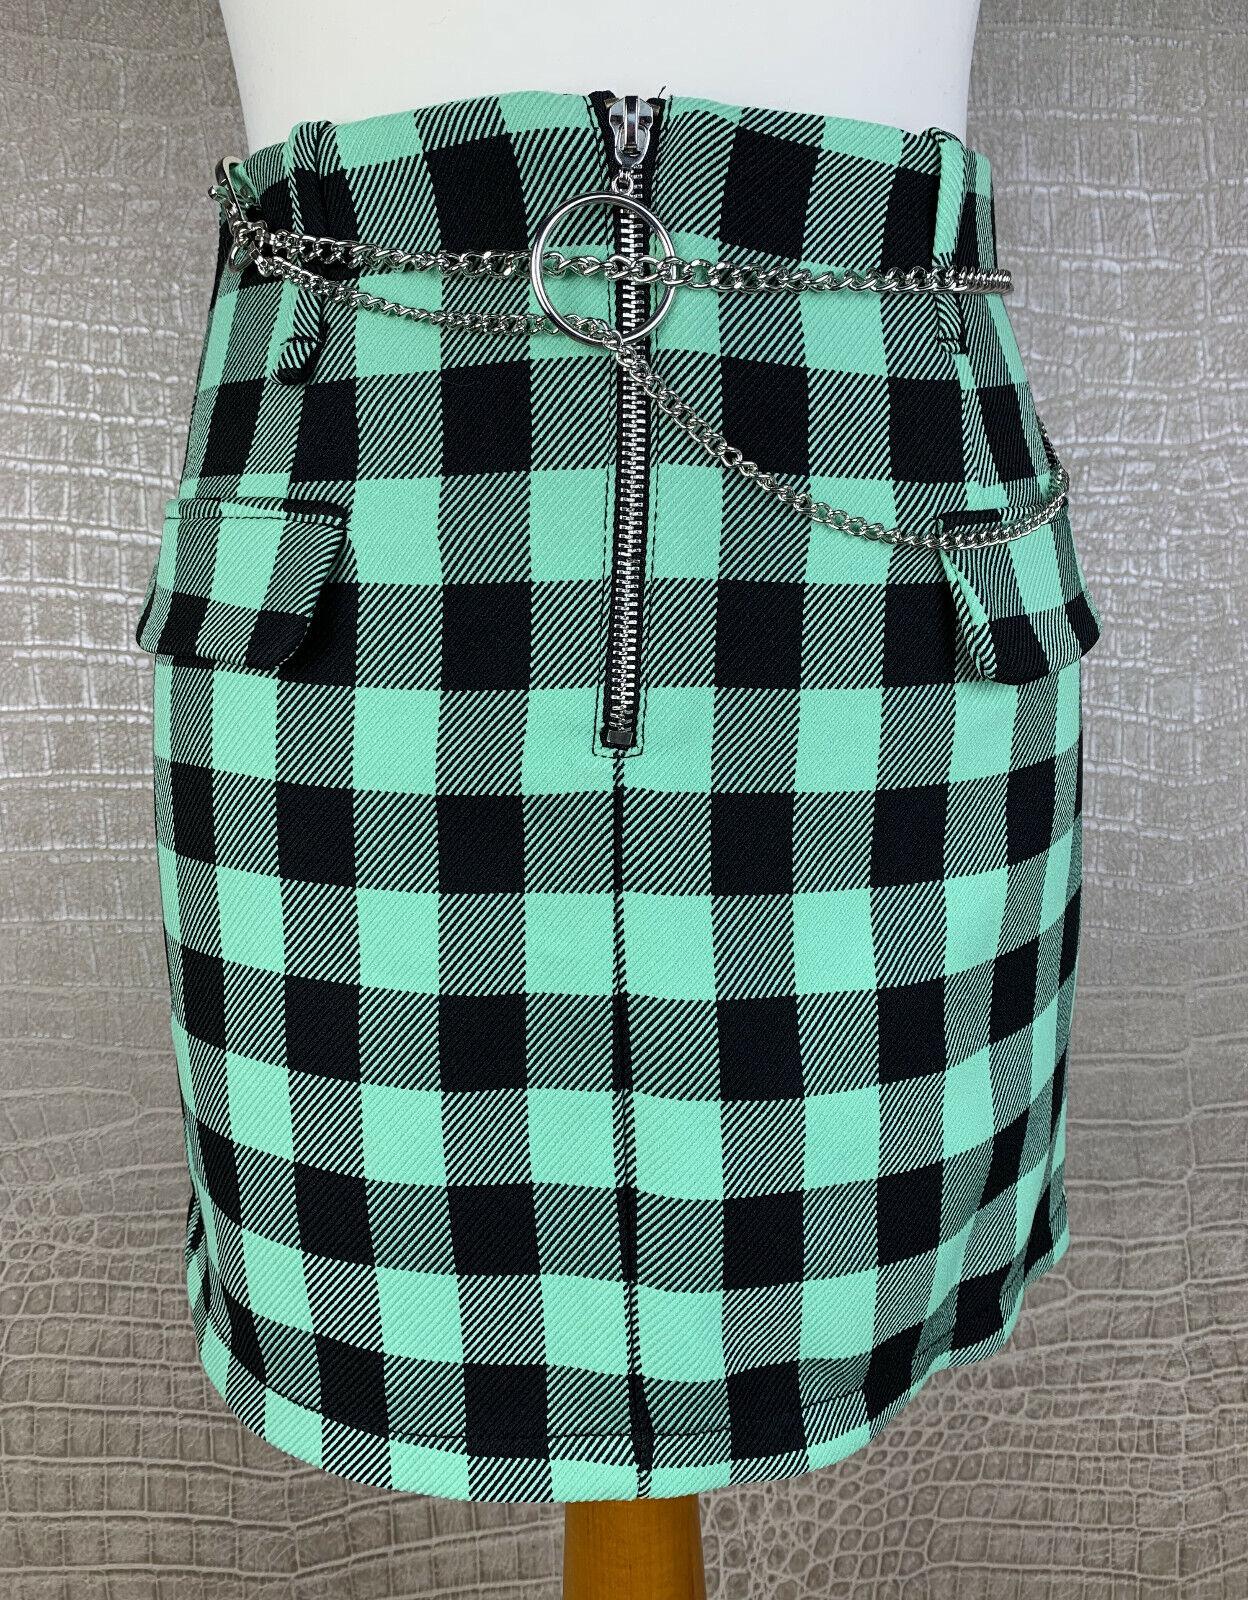 BERSHKA Damen S 34 36 Rock Mini Skirt grün schwarz kariert Metall Kette Punk 501